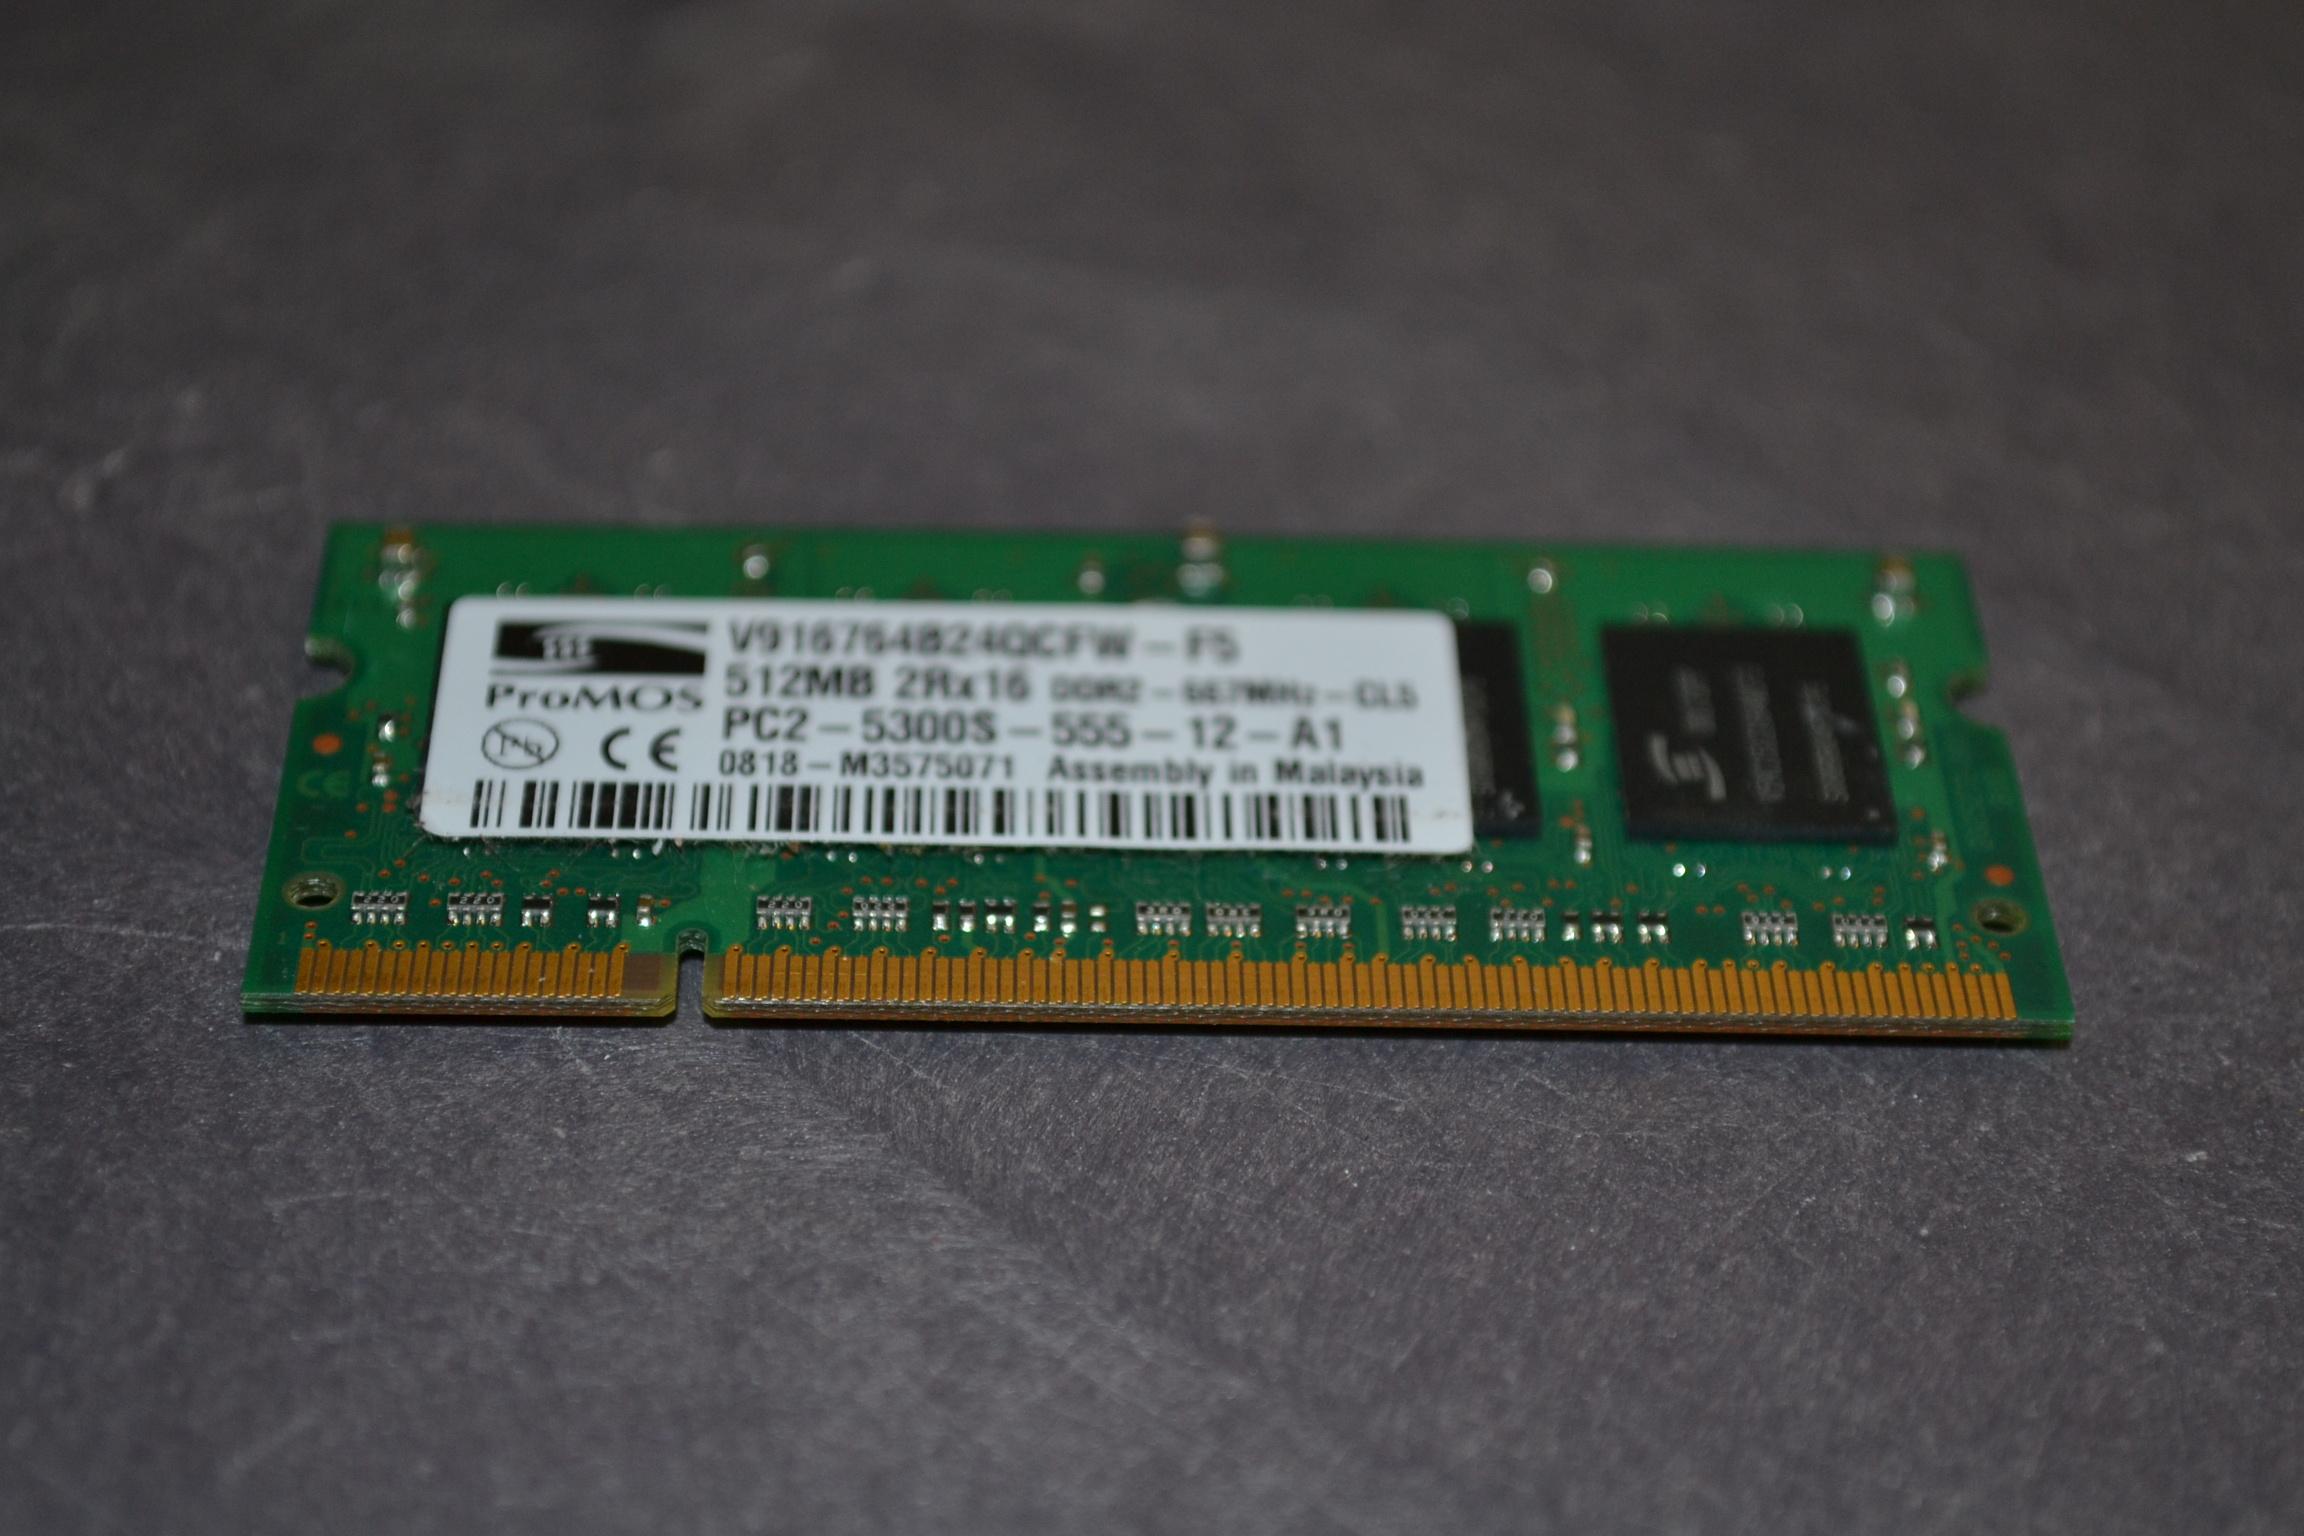 512MB DDR2 667MHZ PC2-5300S V916764B24QBFWF5 Promos V916764B24QBFWF5